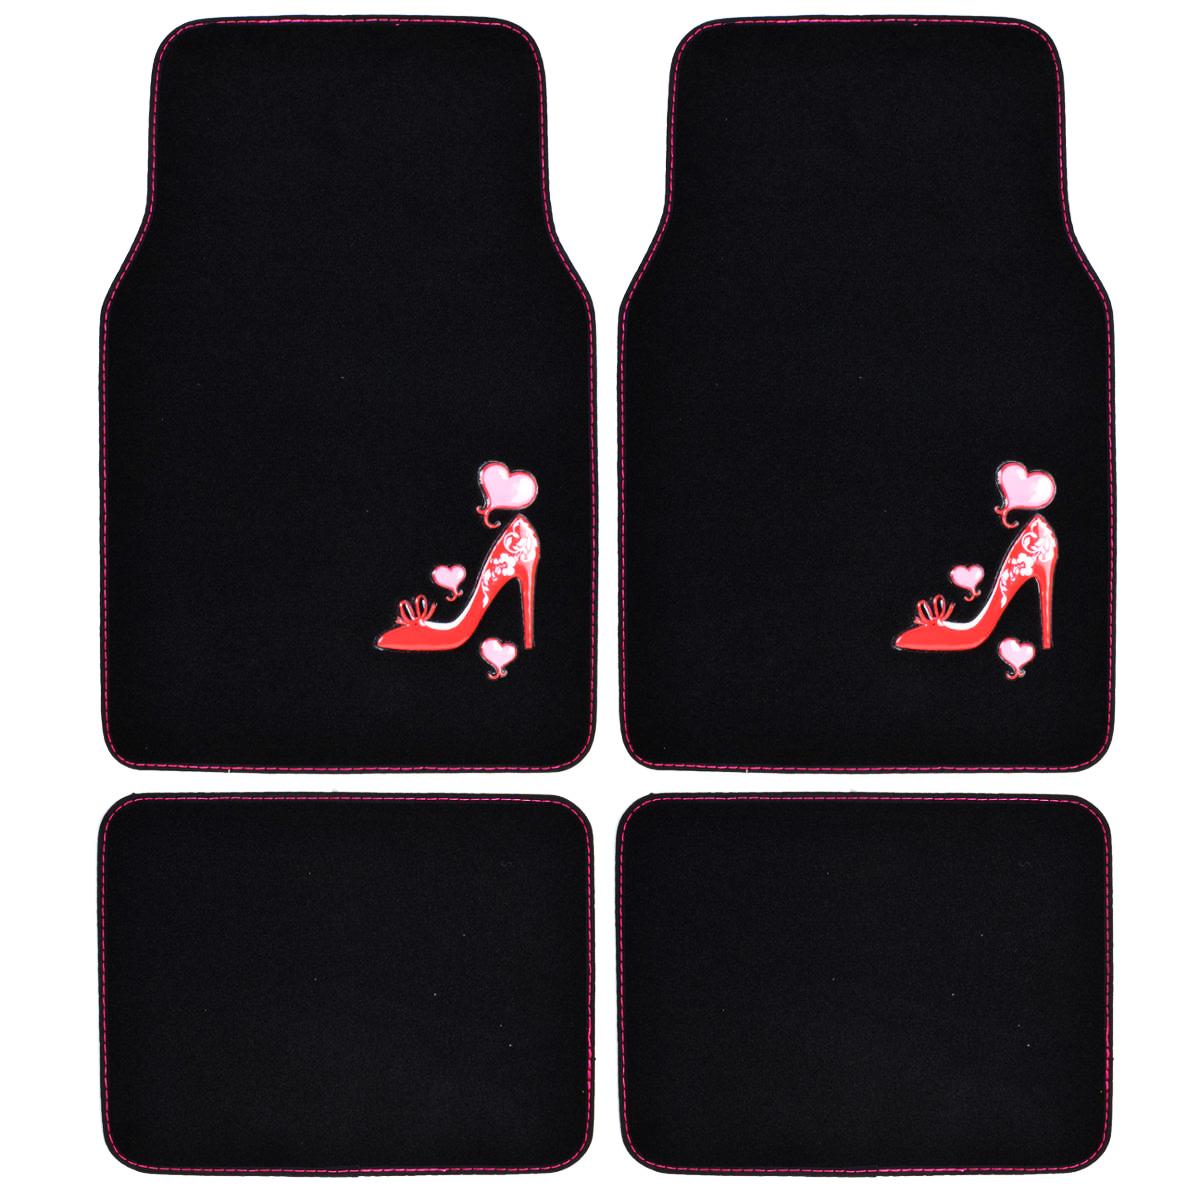 Custom Carpet Floor Mats, 4 PC Car Accessories For Girls